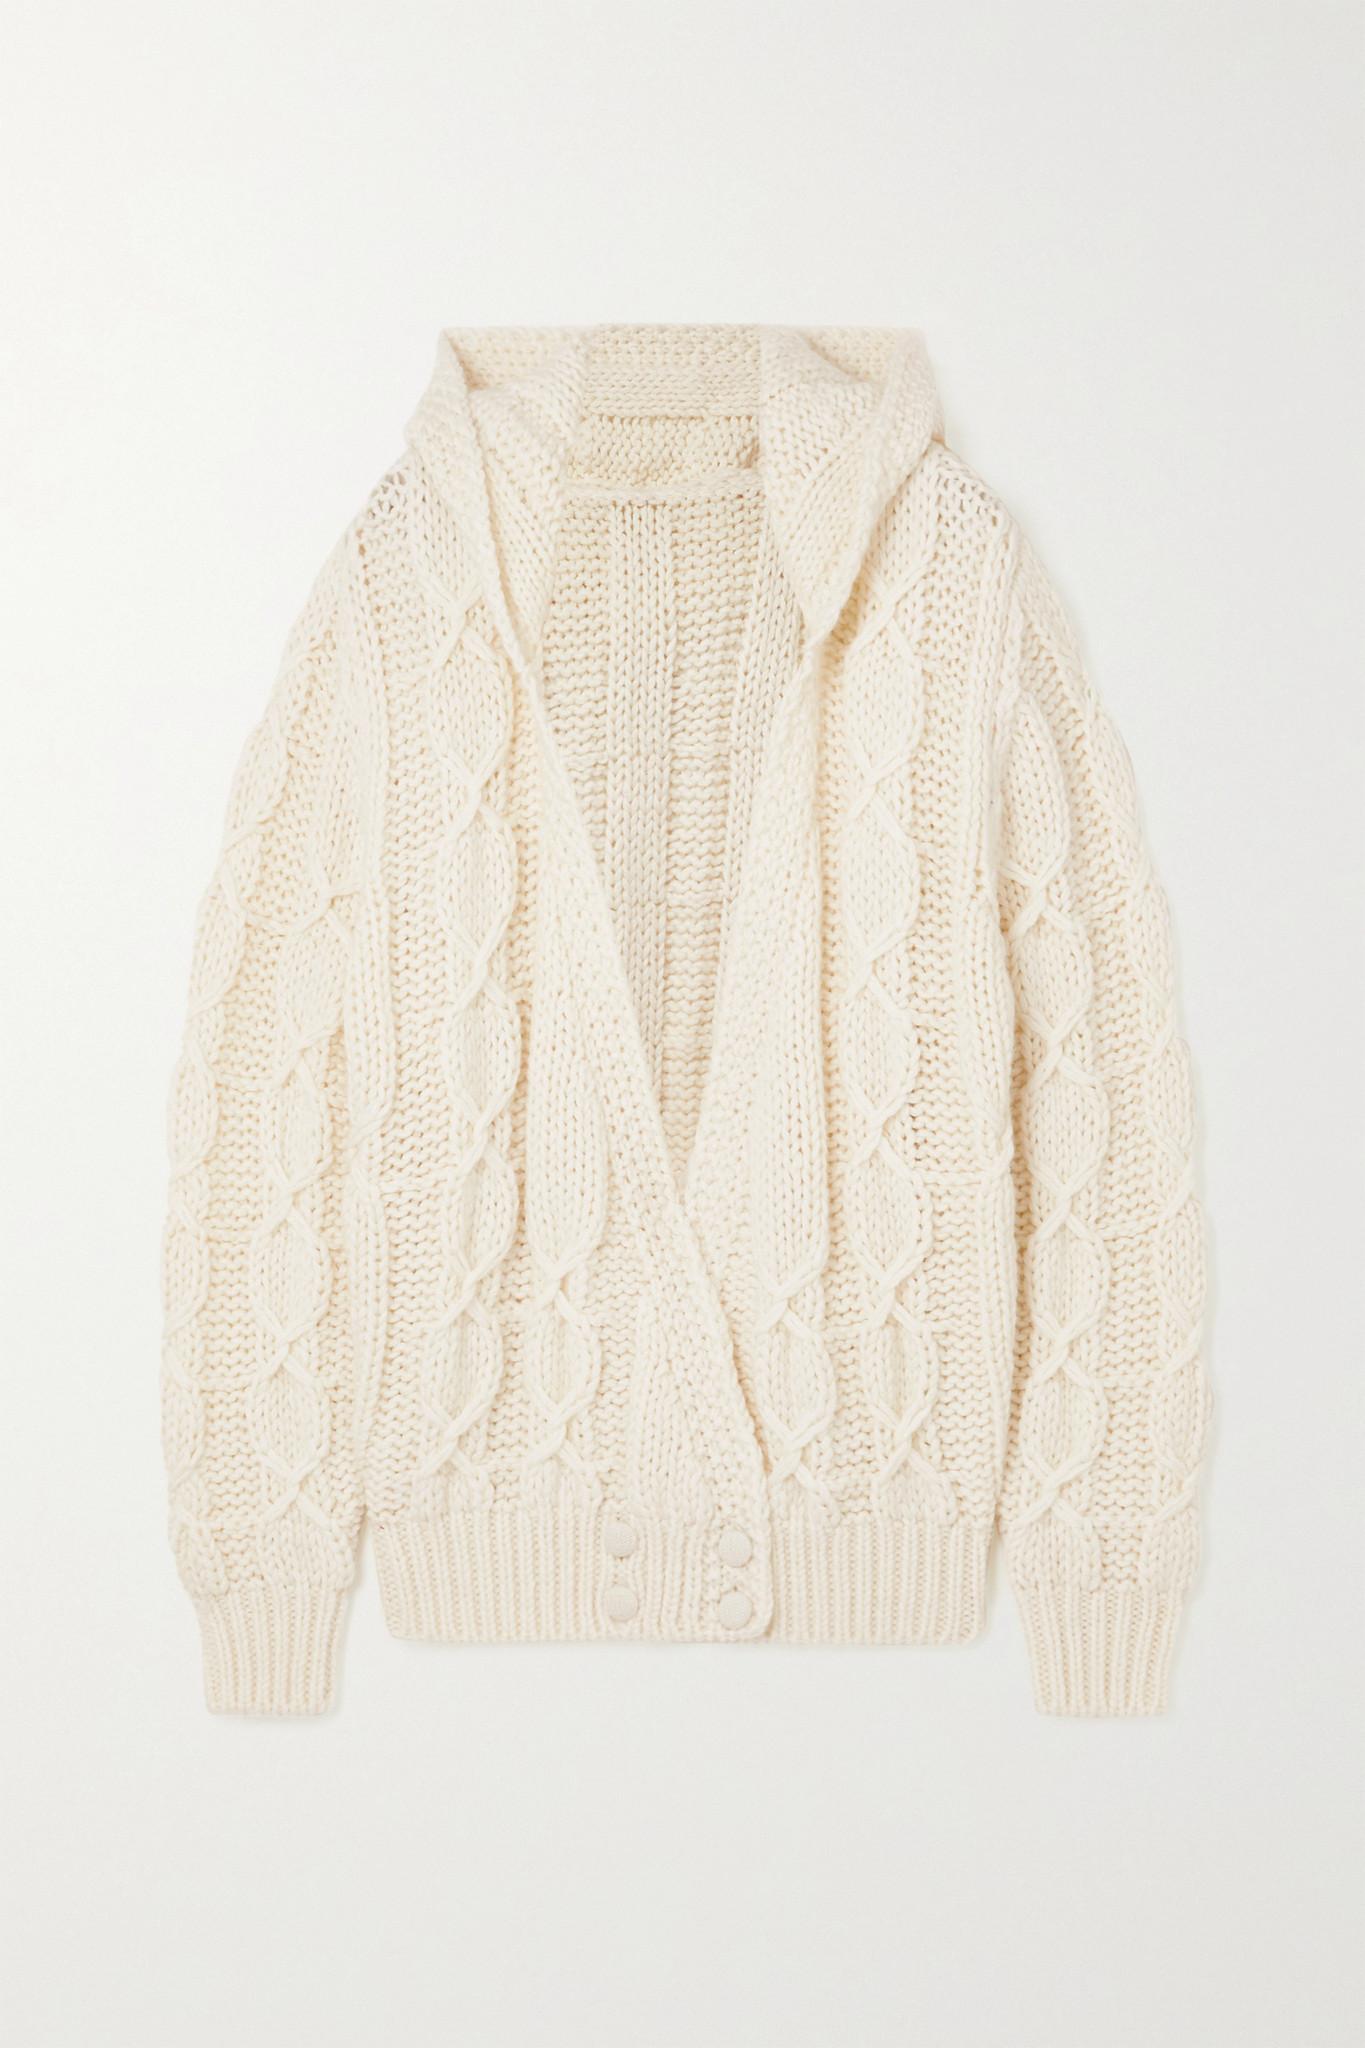 SAINT LAURENT - 绞花针织羊毛混纺连帽开襟衫 - 白色 - medium